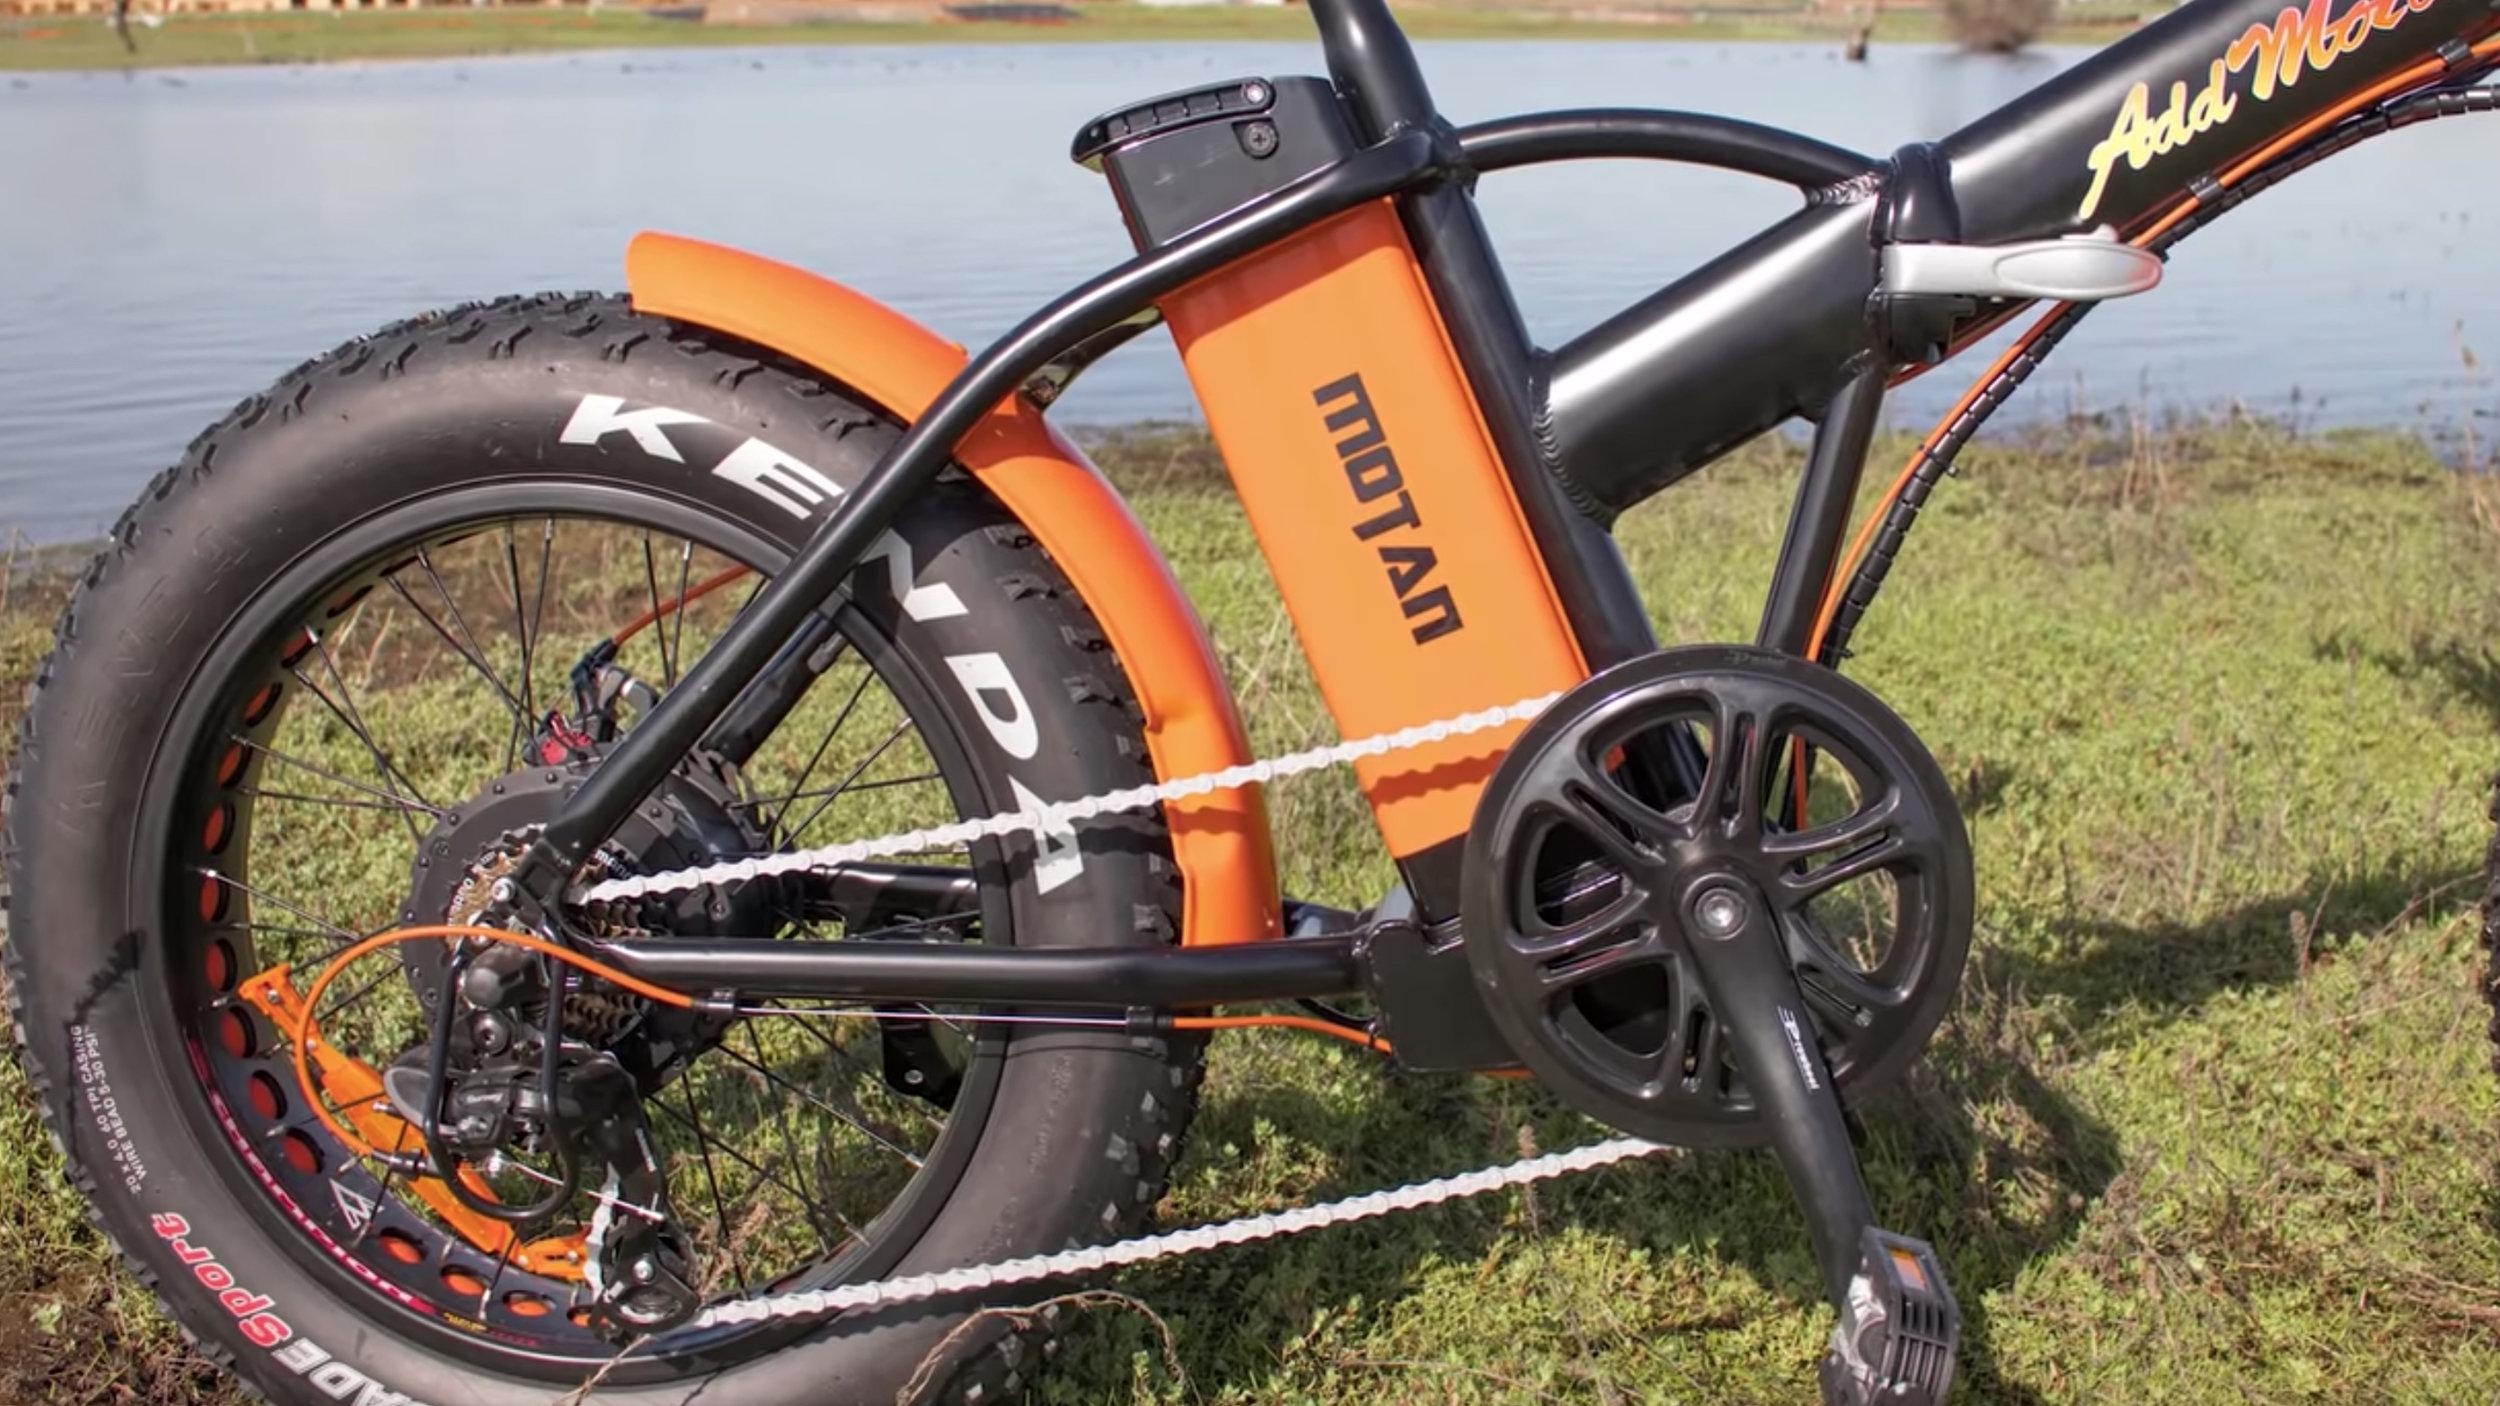 electrified-reviews-addmotor-motan-m150p7-electric-bike-review-profile.jpg